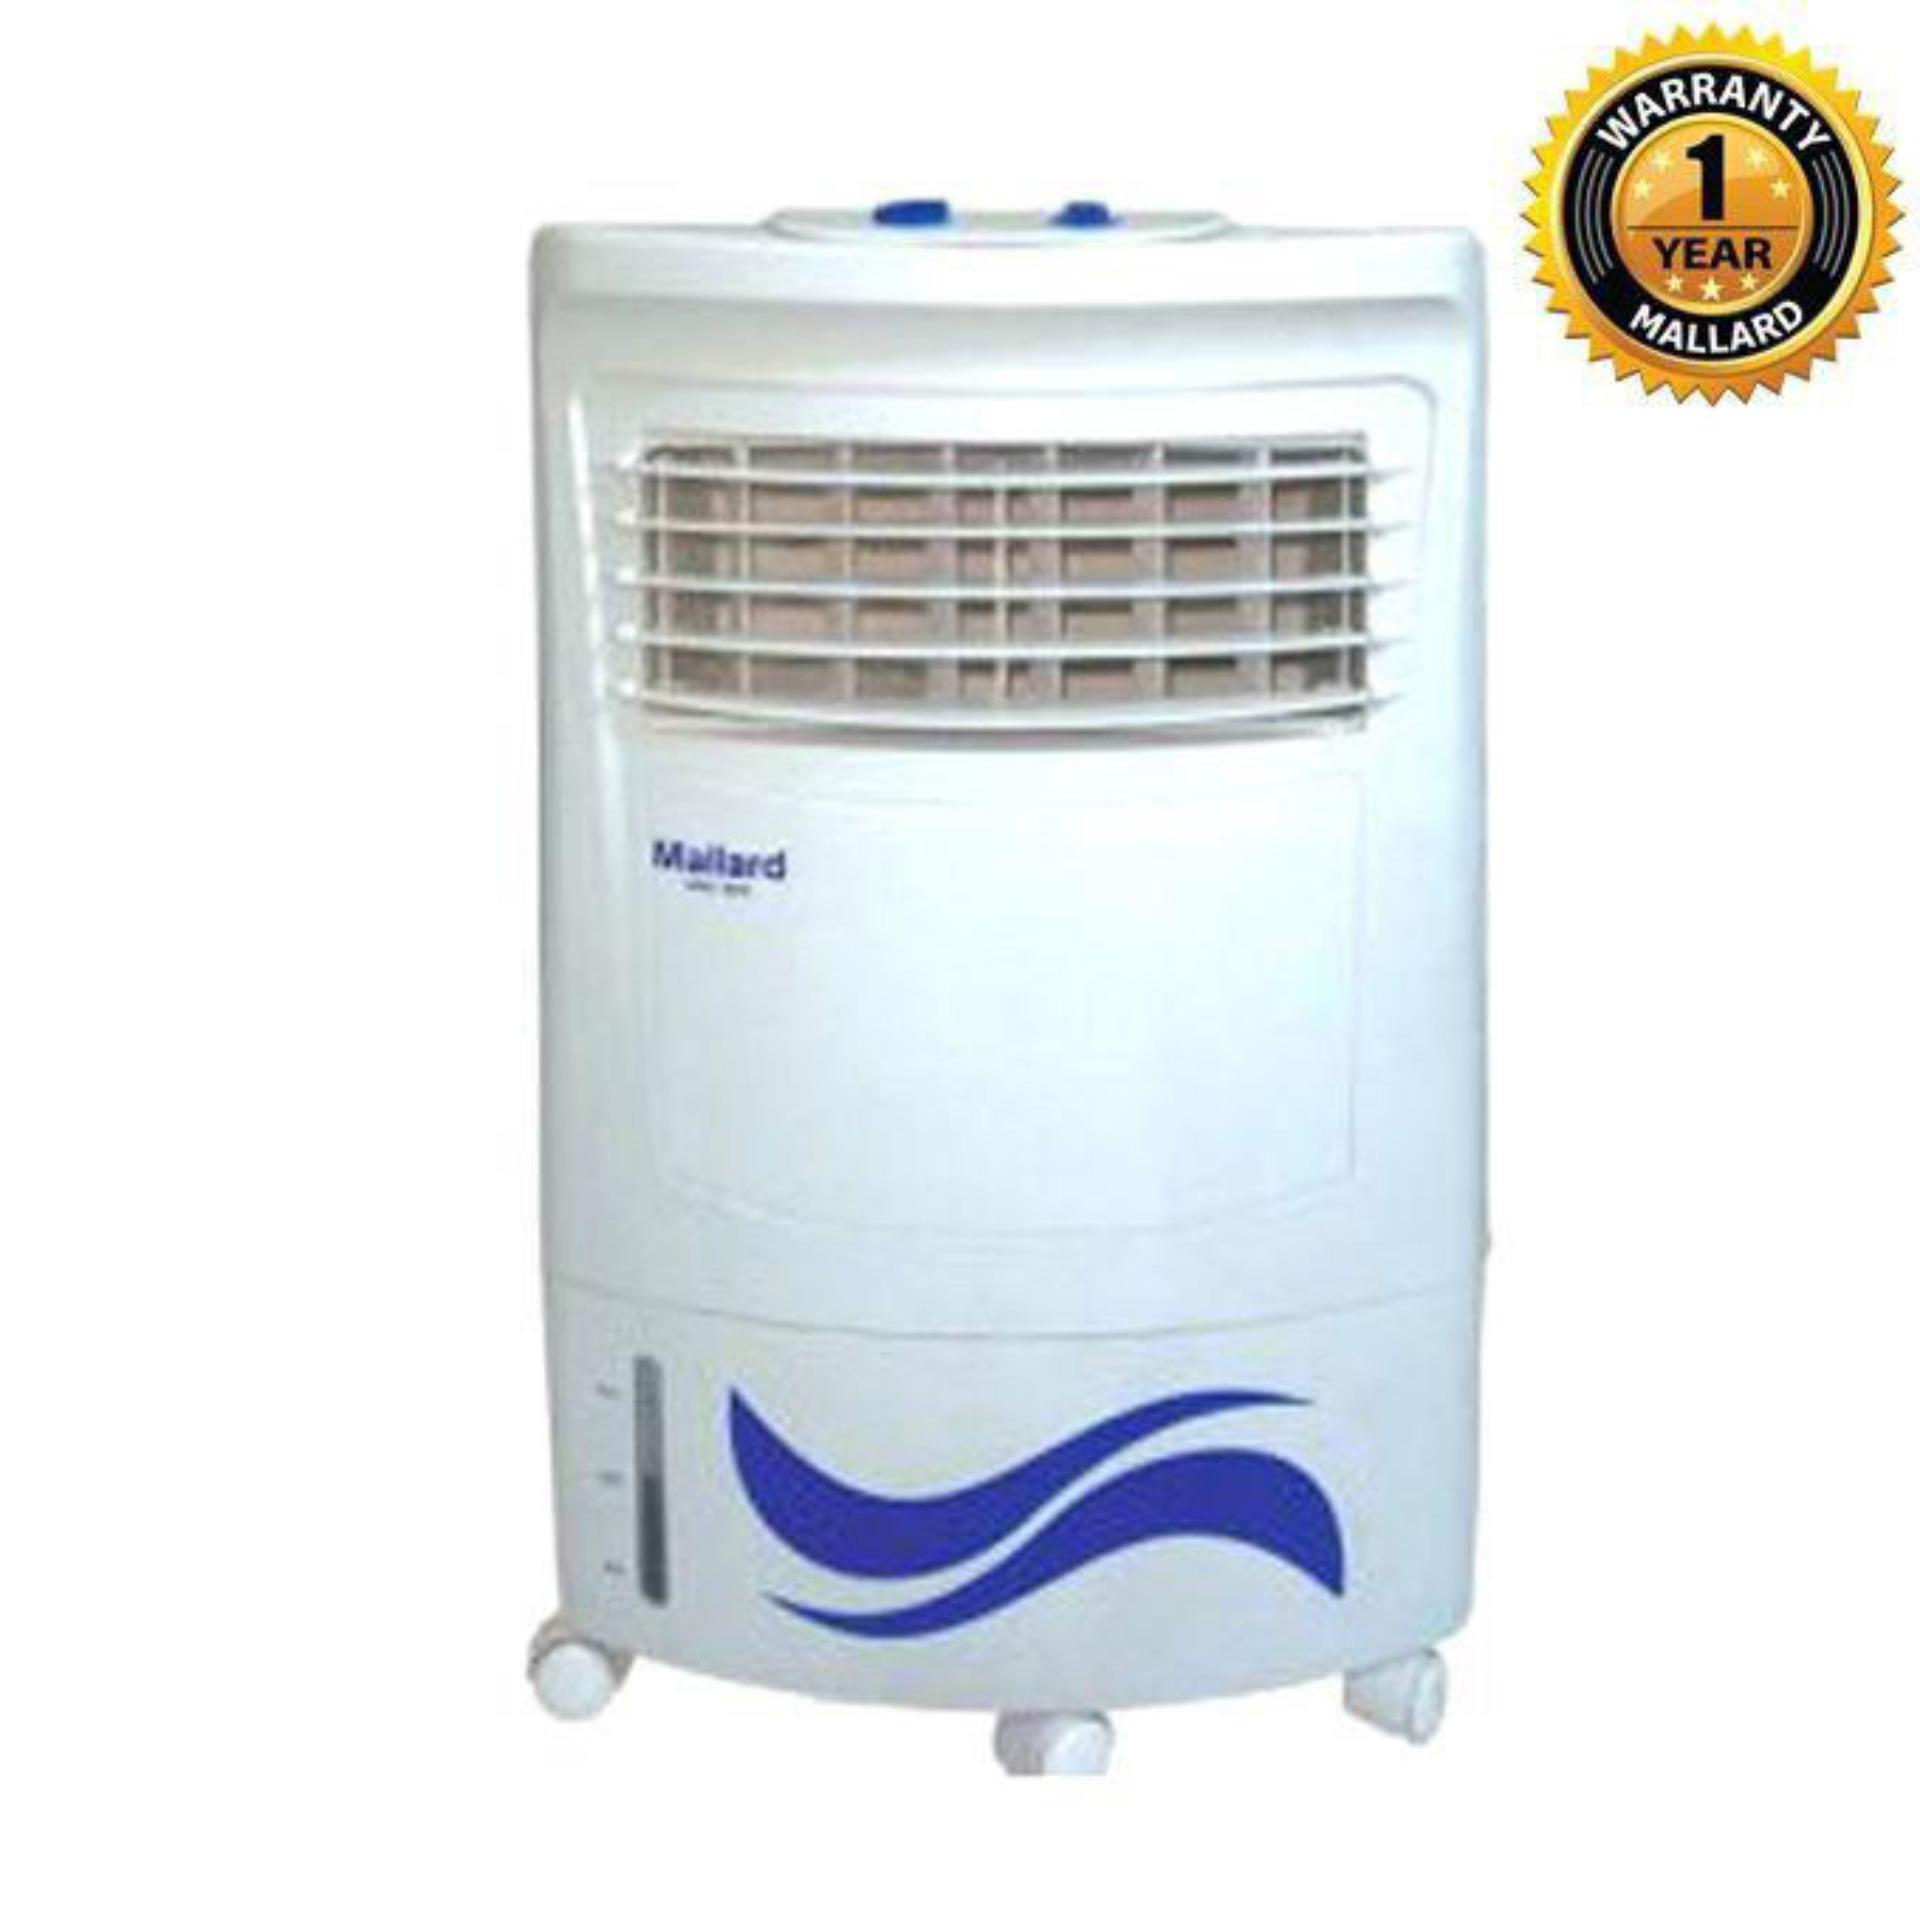 MAC 923 - Evaporative Air Cooler – 25 Liter - White